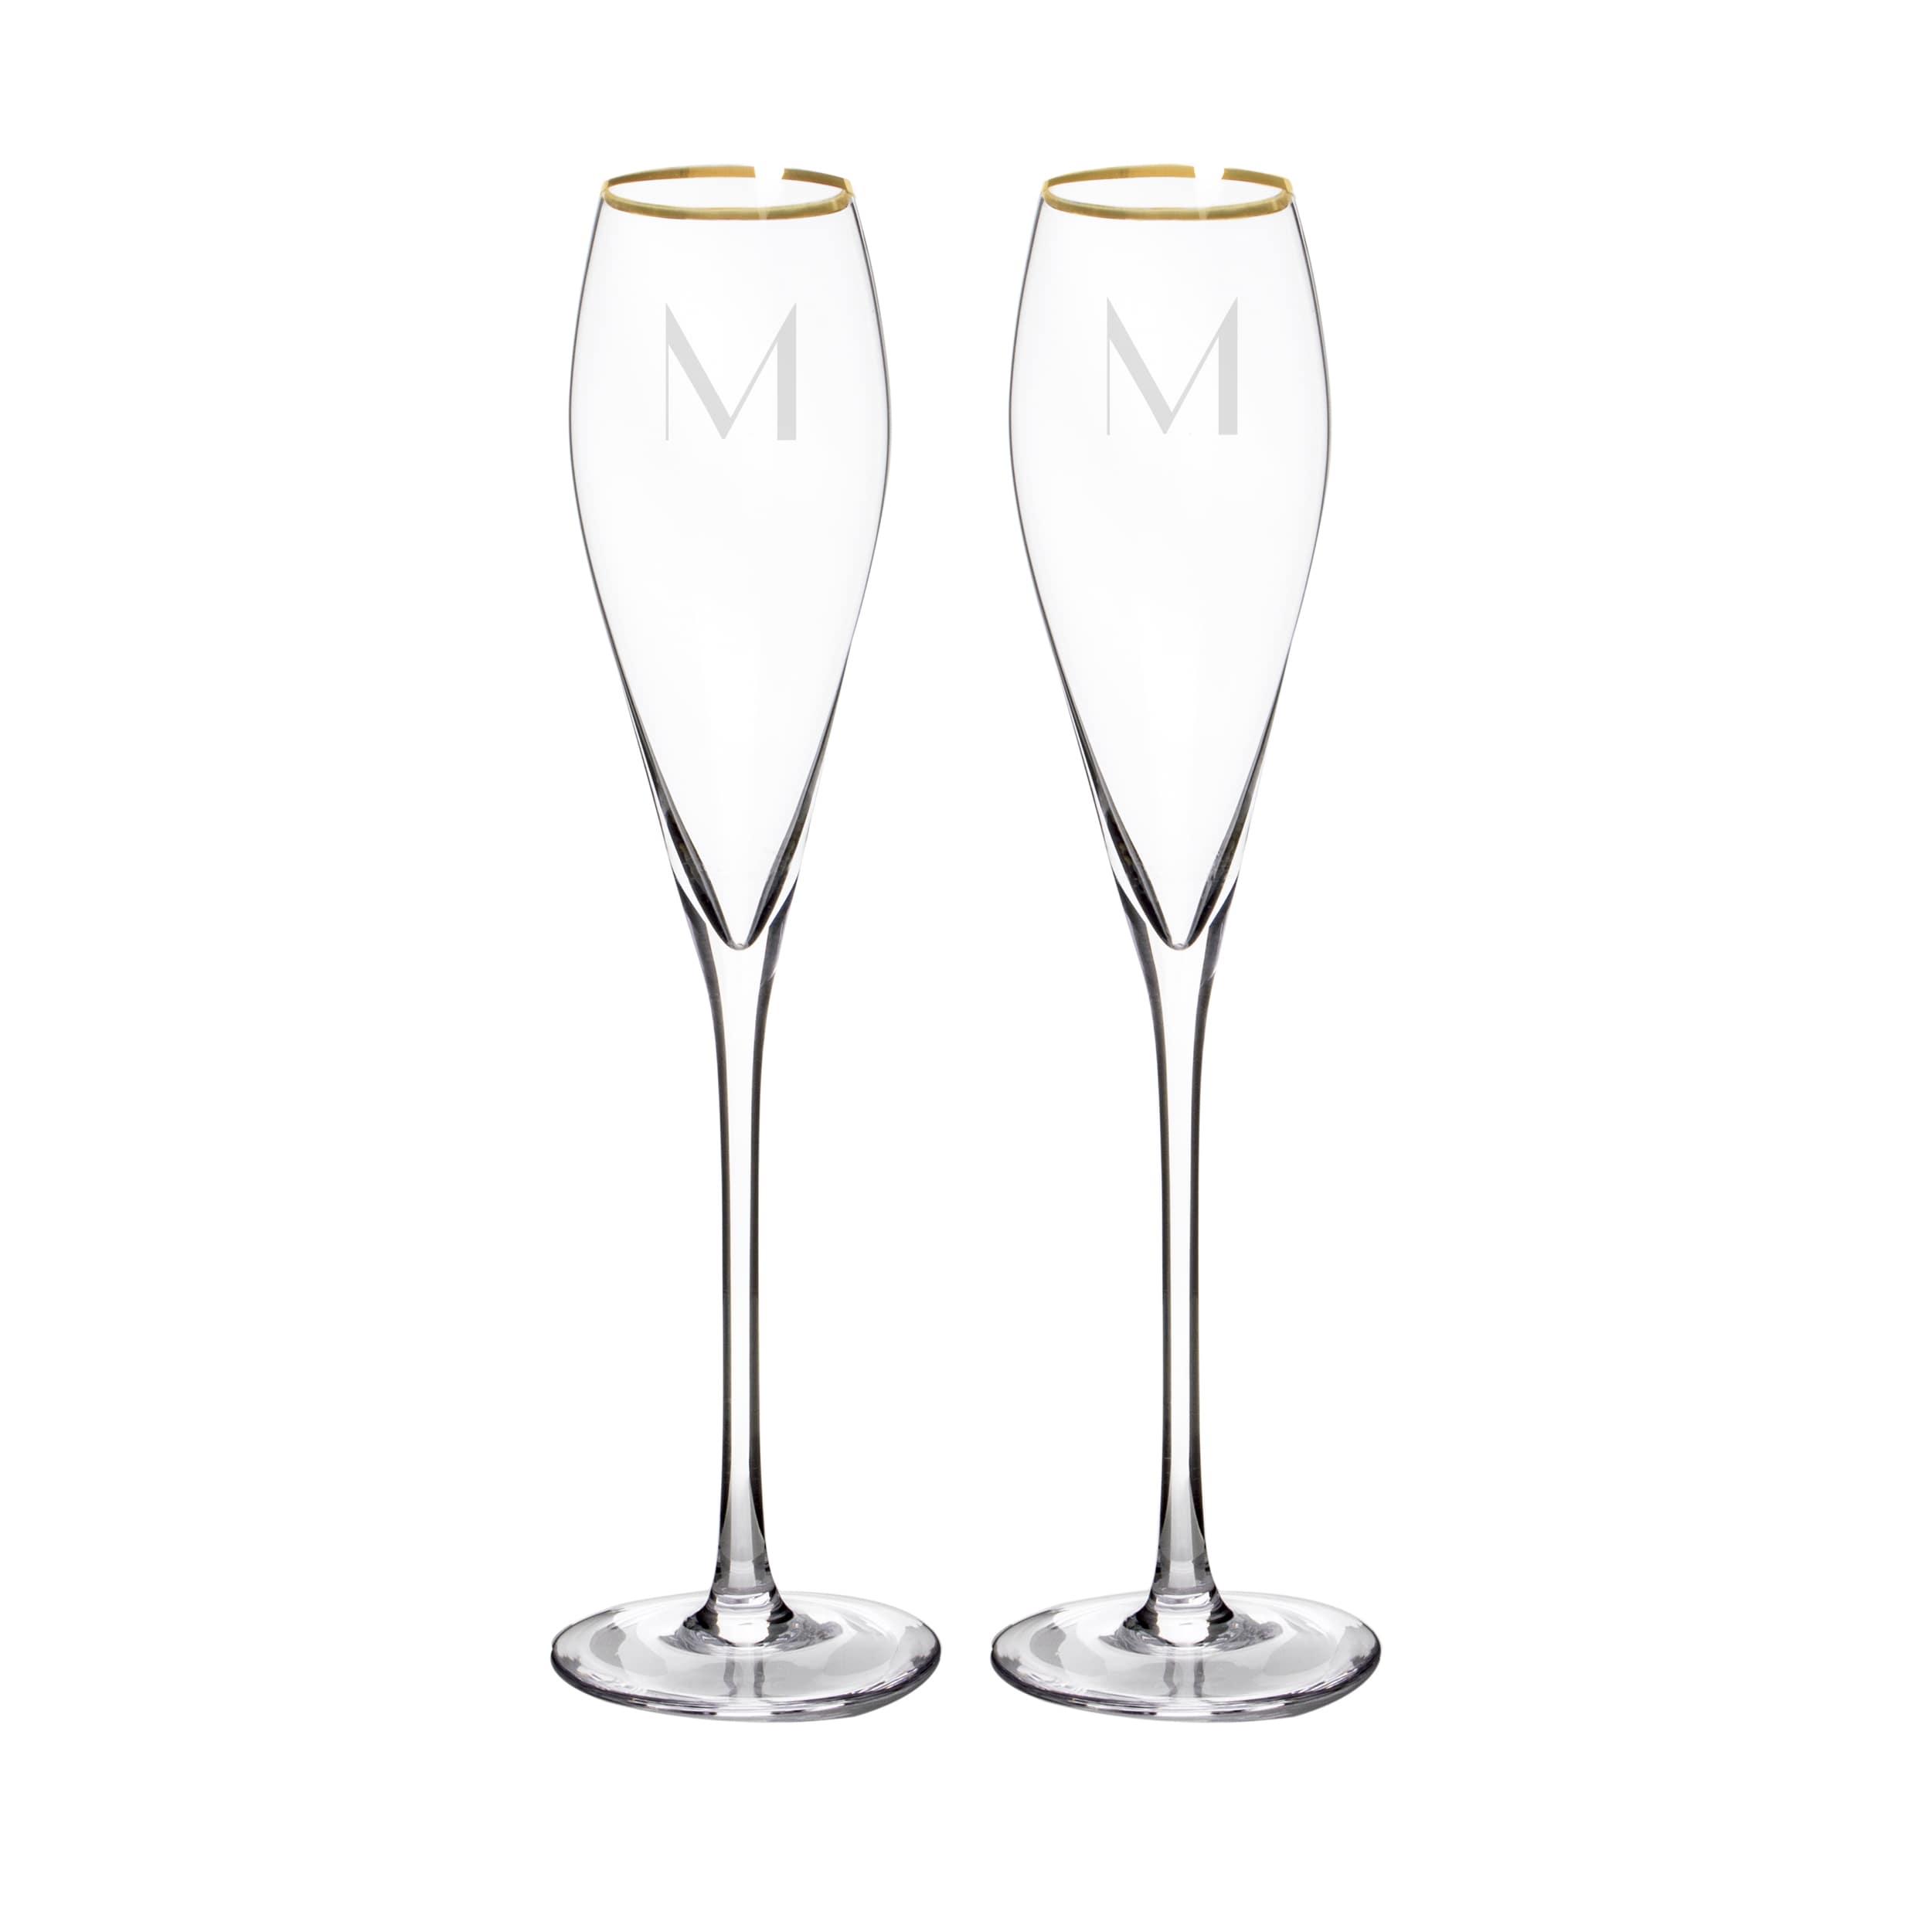 Shop Personalized Gold Champagne Flutes & Cake Serving Set - On Sale ...